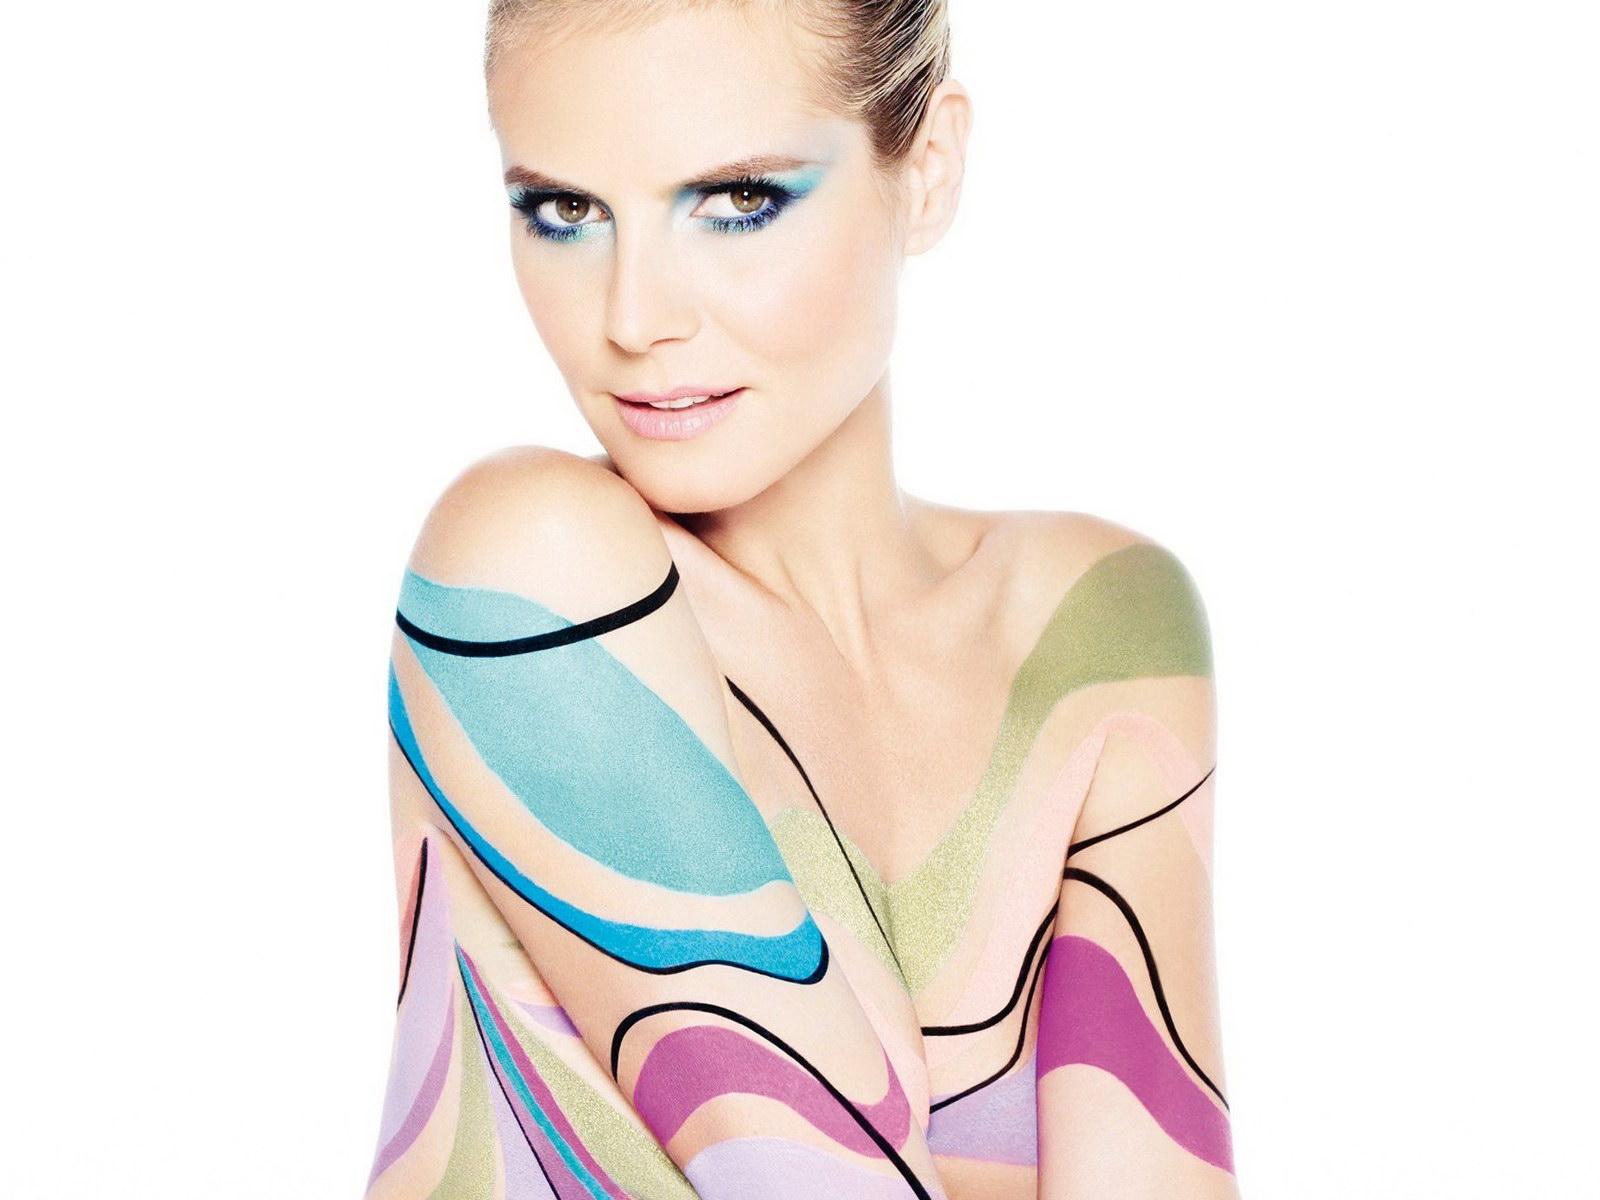 http://1.bp.blogspot.com/-yeqX4VaqFiQ/T5qLKBn08NI/AAAAAAAAAi4/FR17DmdO7y8/s1600/Heidi+Klum+nude+bodypaint+for+Astor+Cosmetics+2.jpg